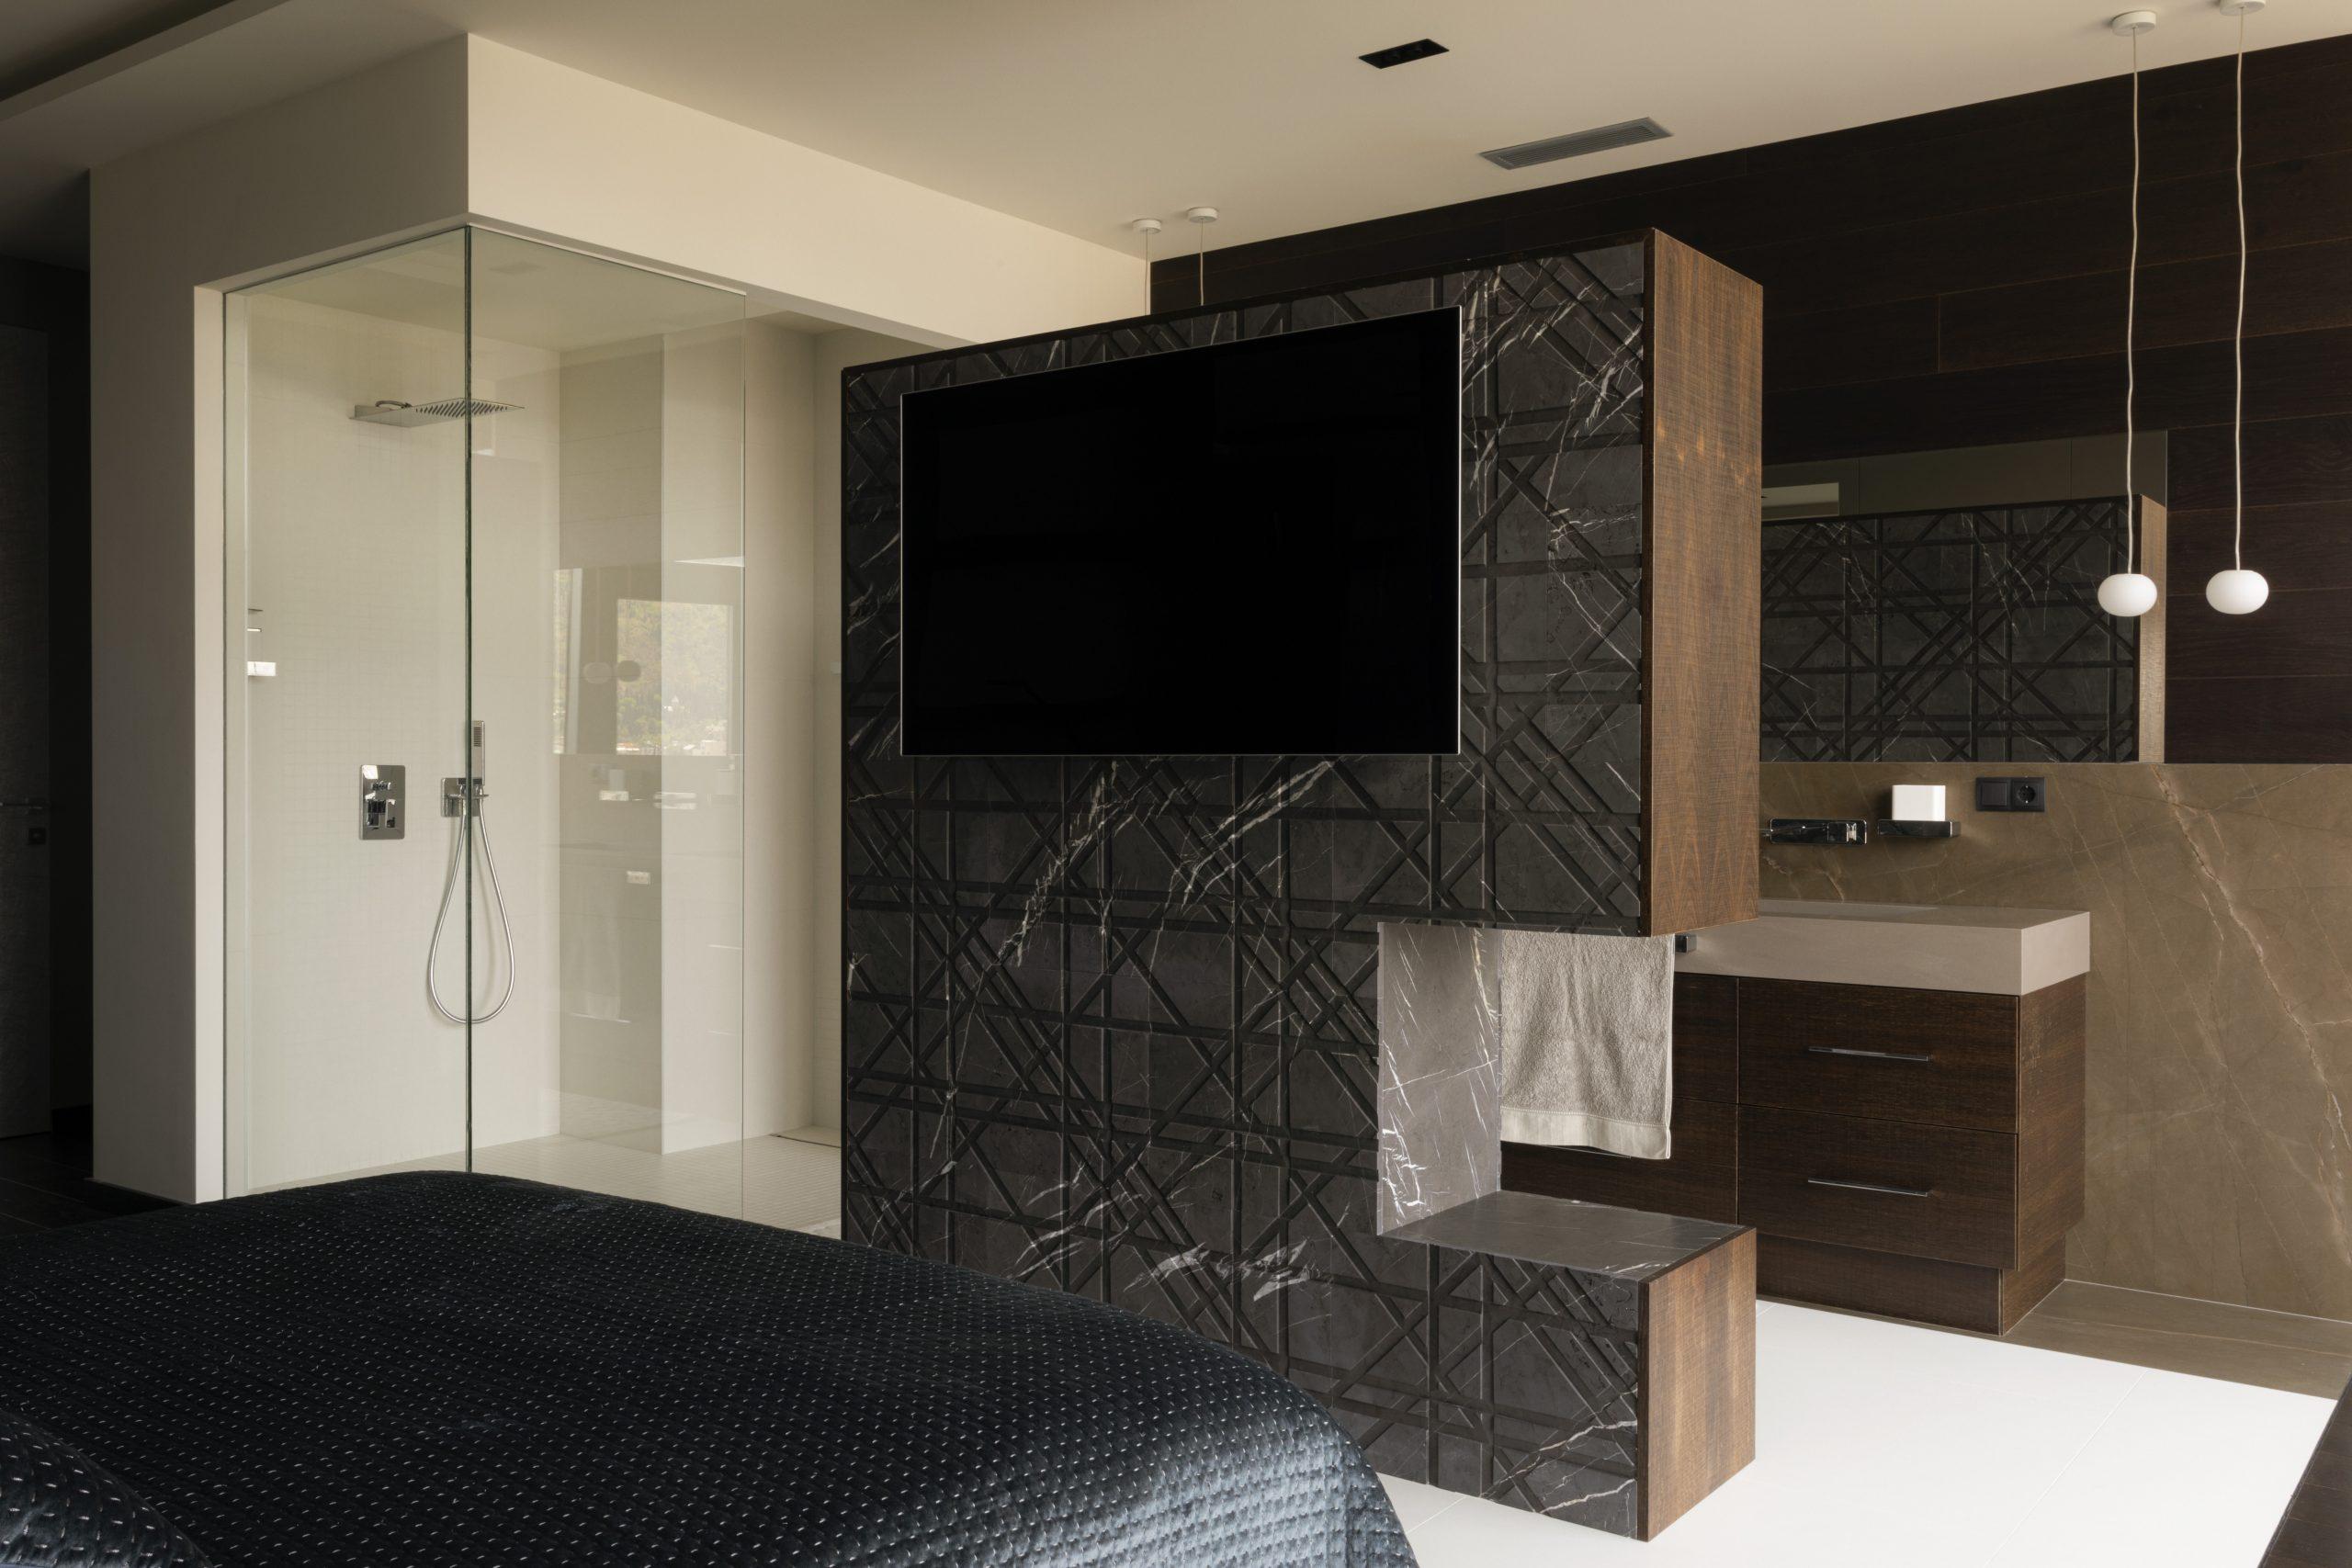 LithosDesign_KingDavid_Tartan interior wall covering